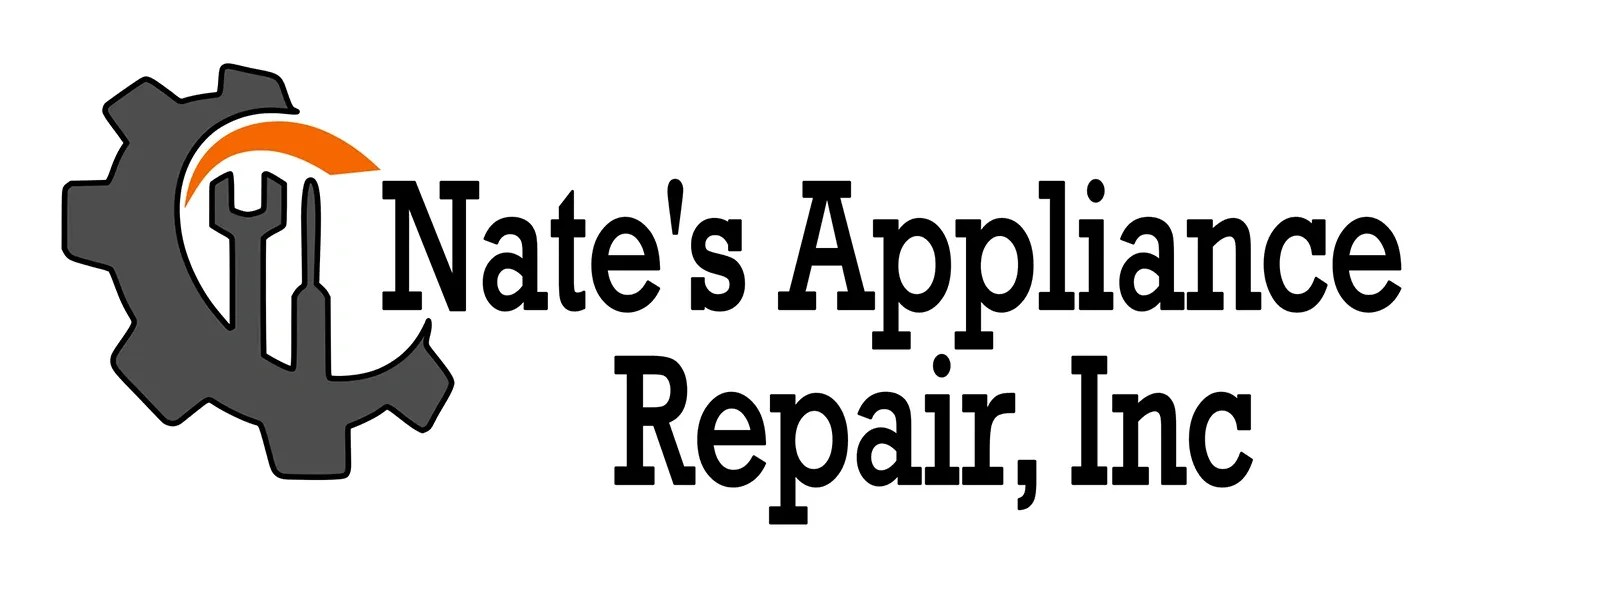 Nate's Appliance Repair Inc